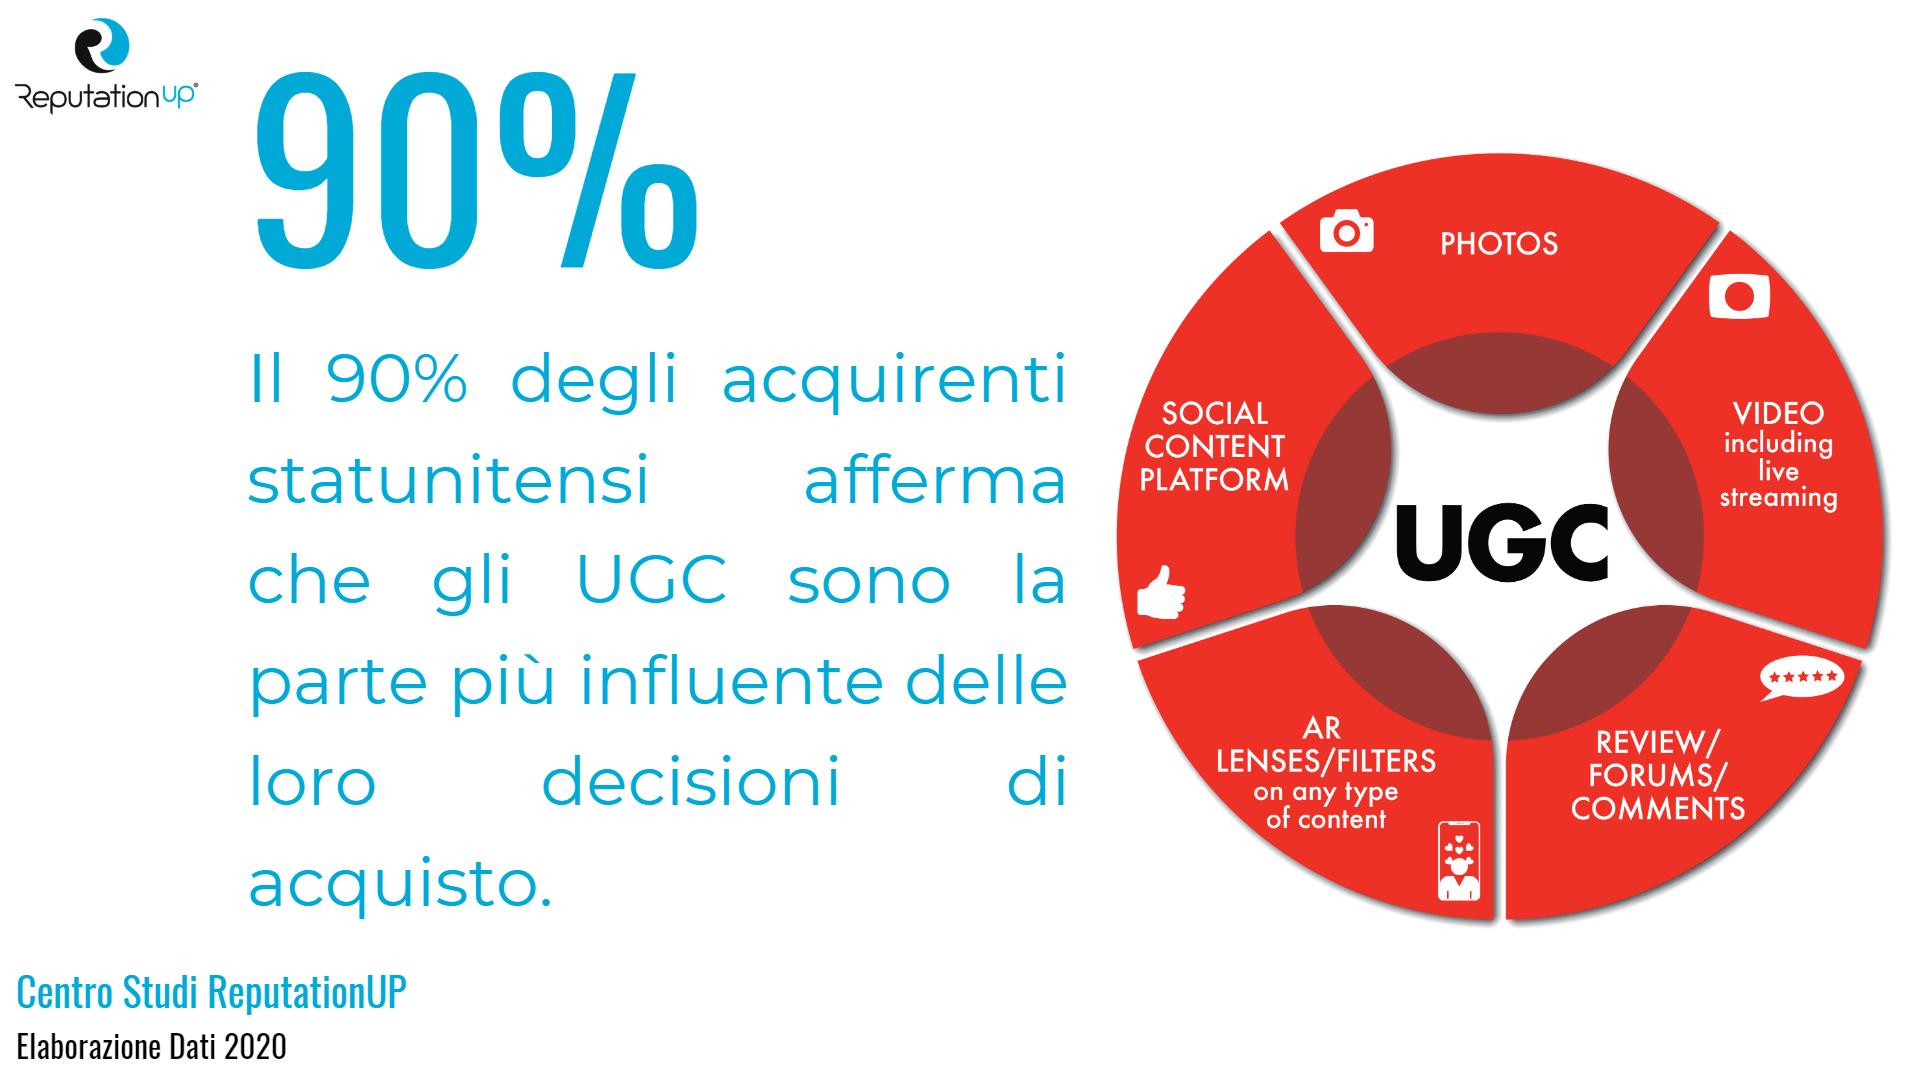 statistiche 2020 user generated content centro studi reputationup